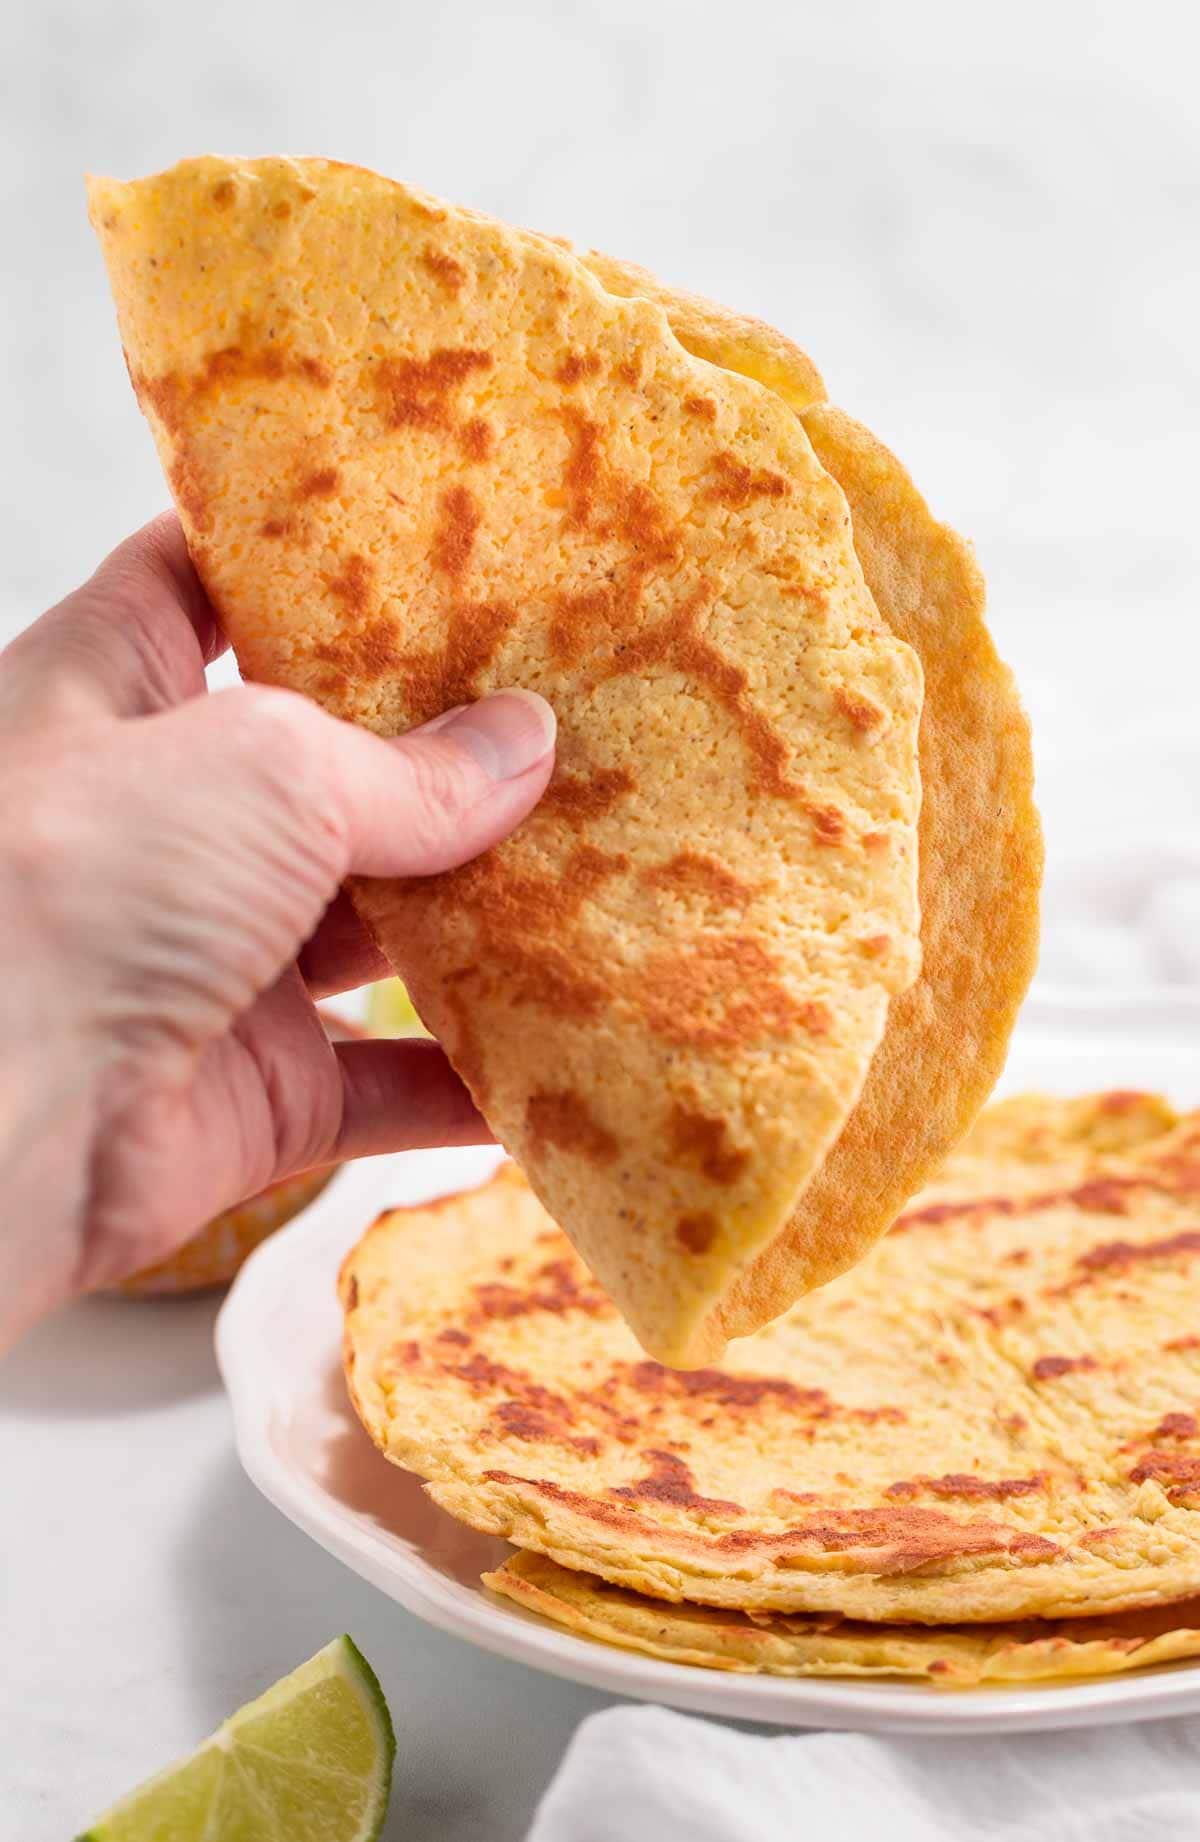 A hand folding a keto tortilla in half.